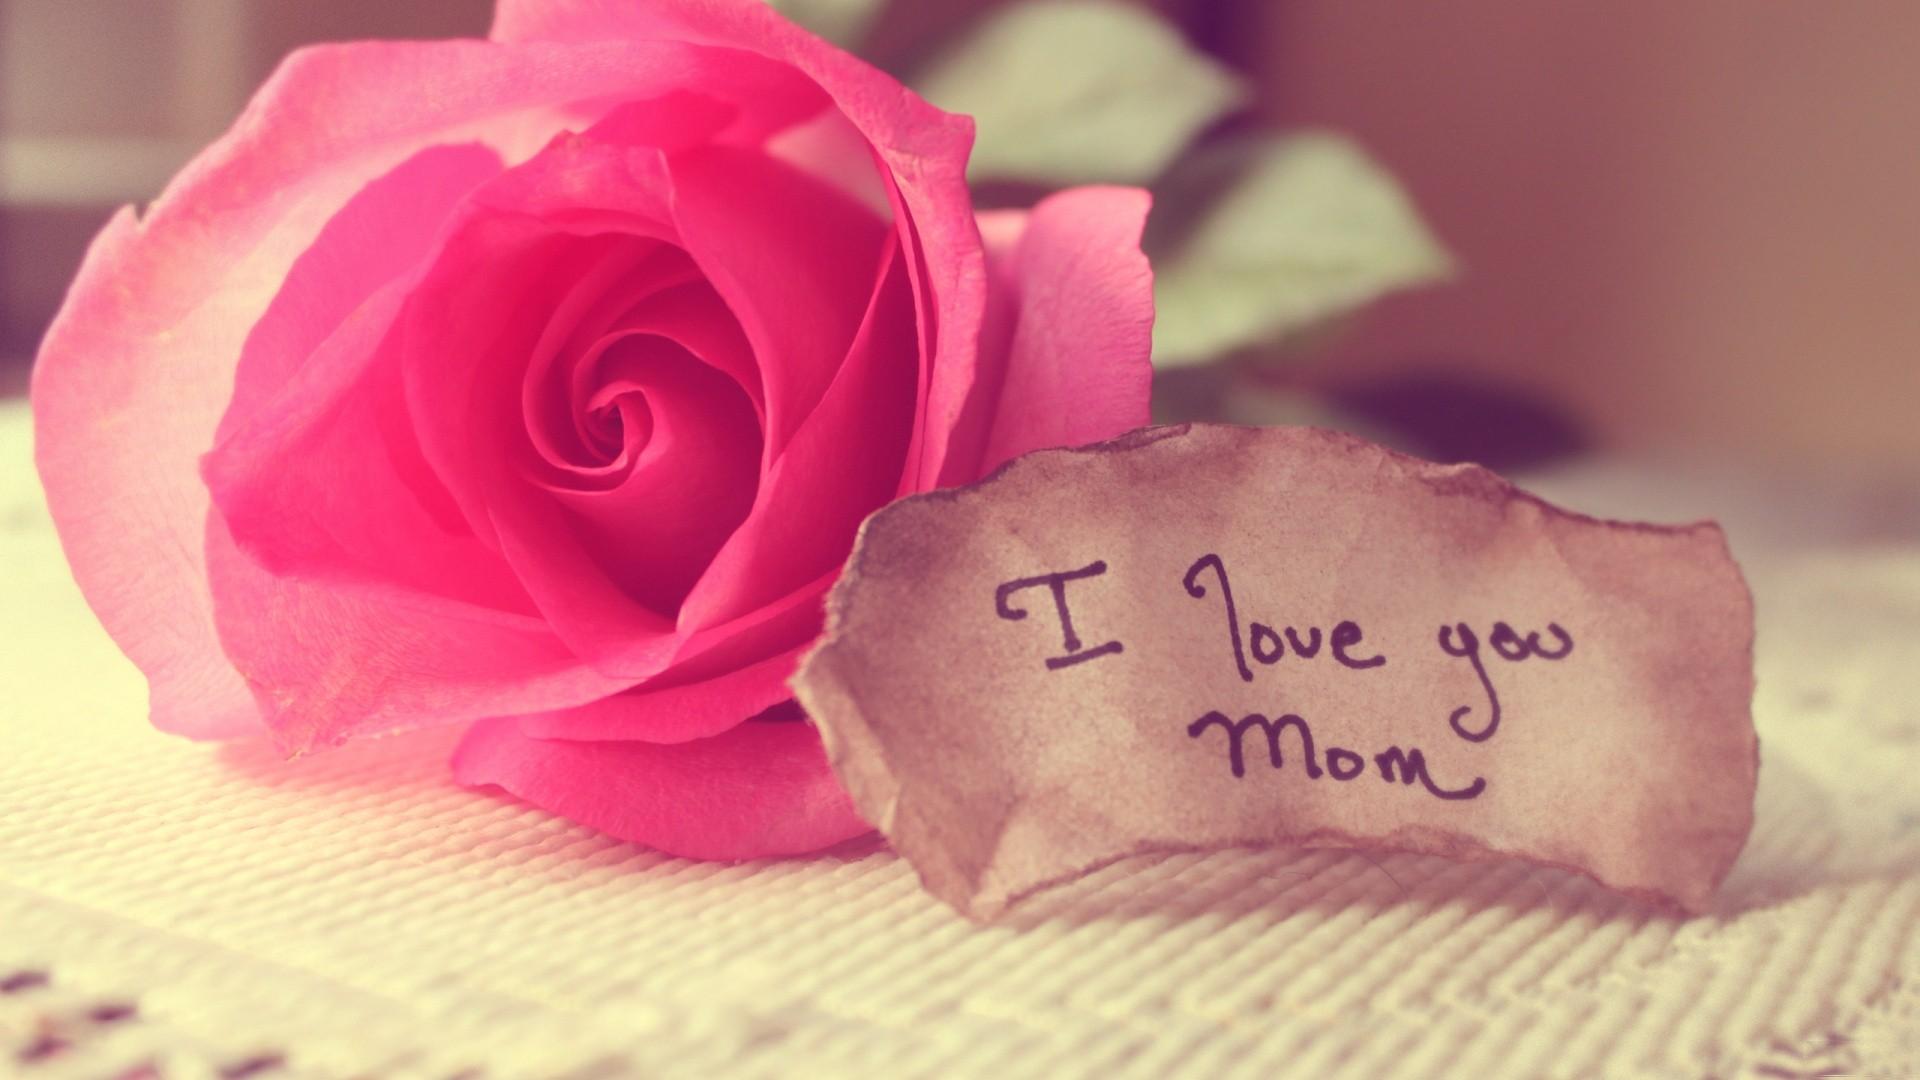 Mom quote #8